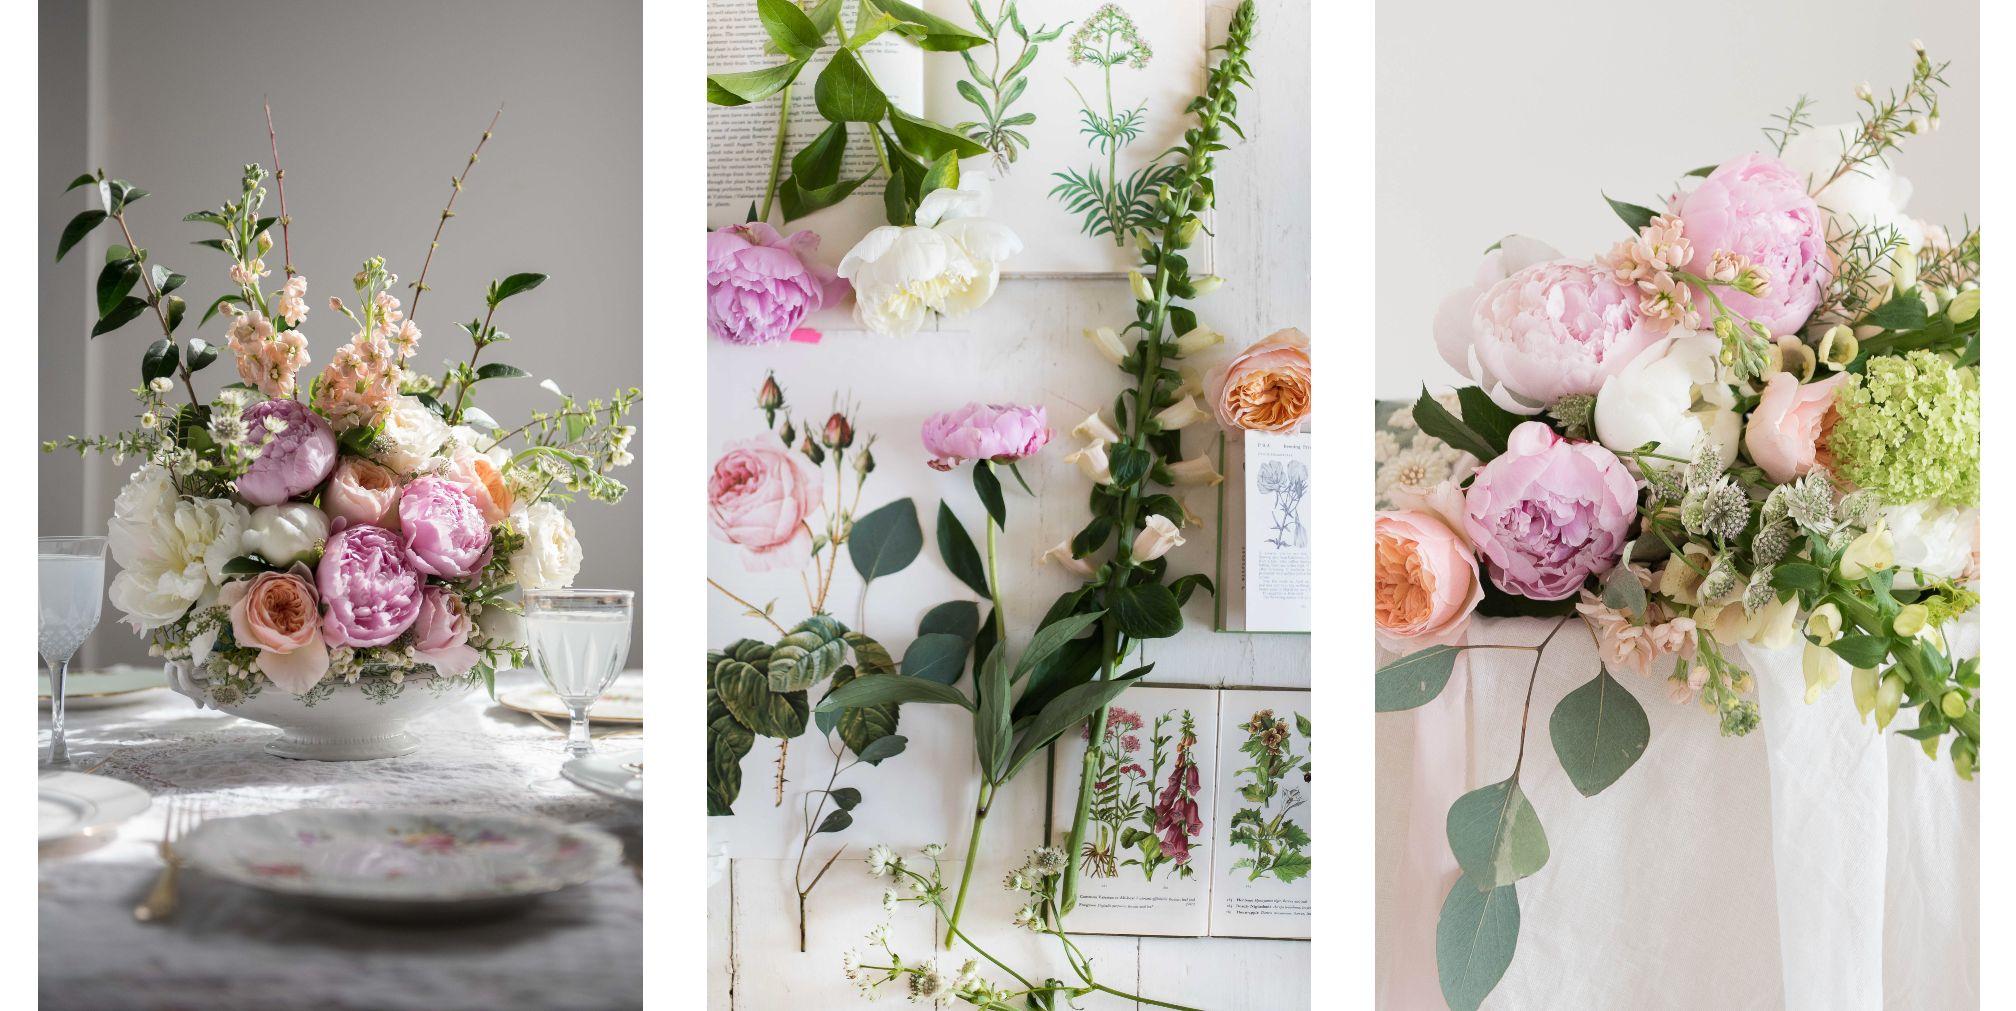 6 Pretty Ways To Decorate With Flowers Easy Flower Arrangement Ideas